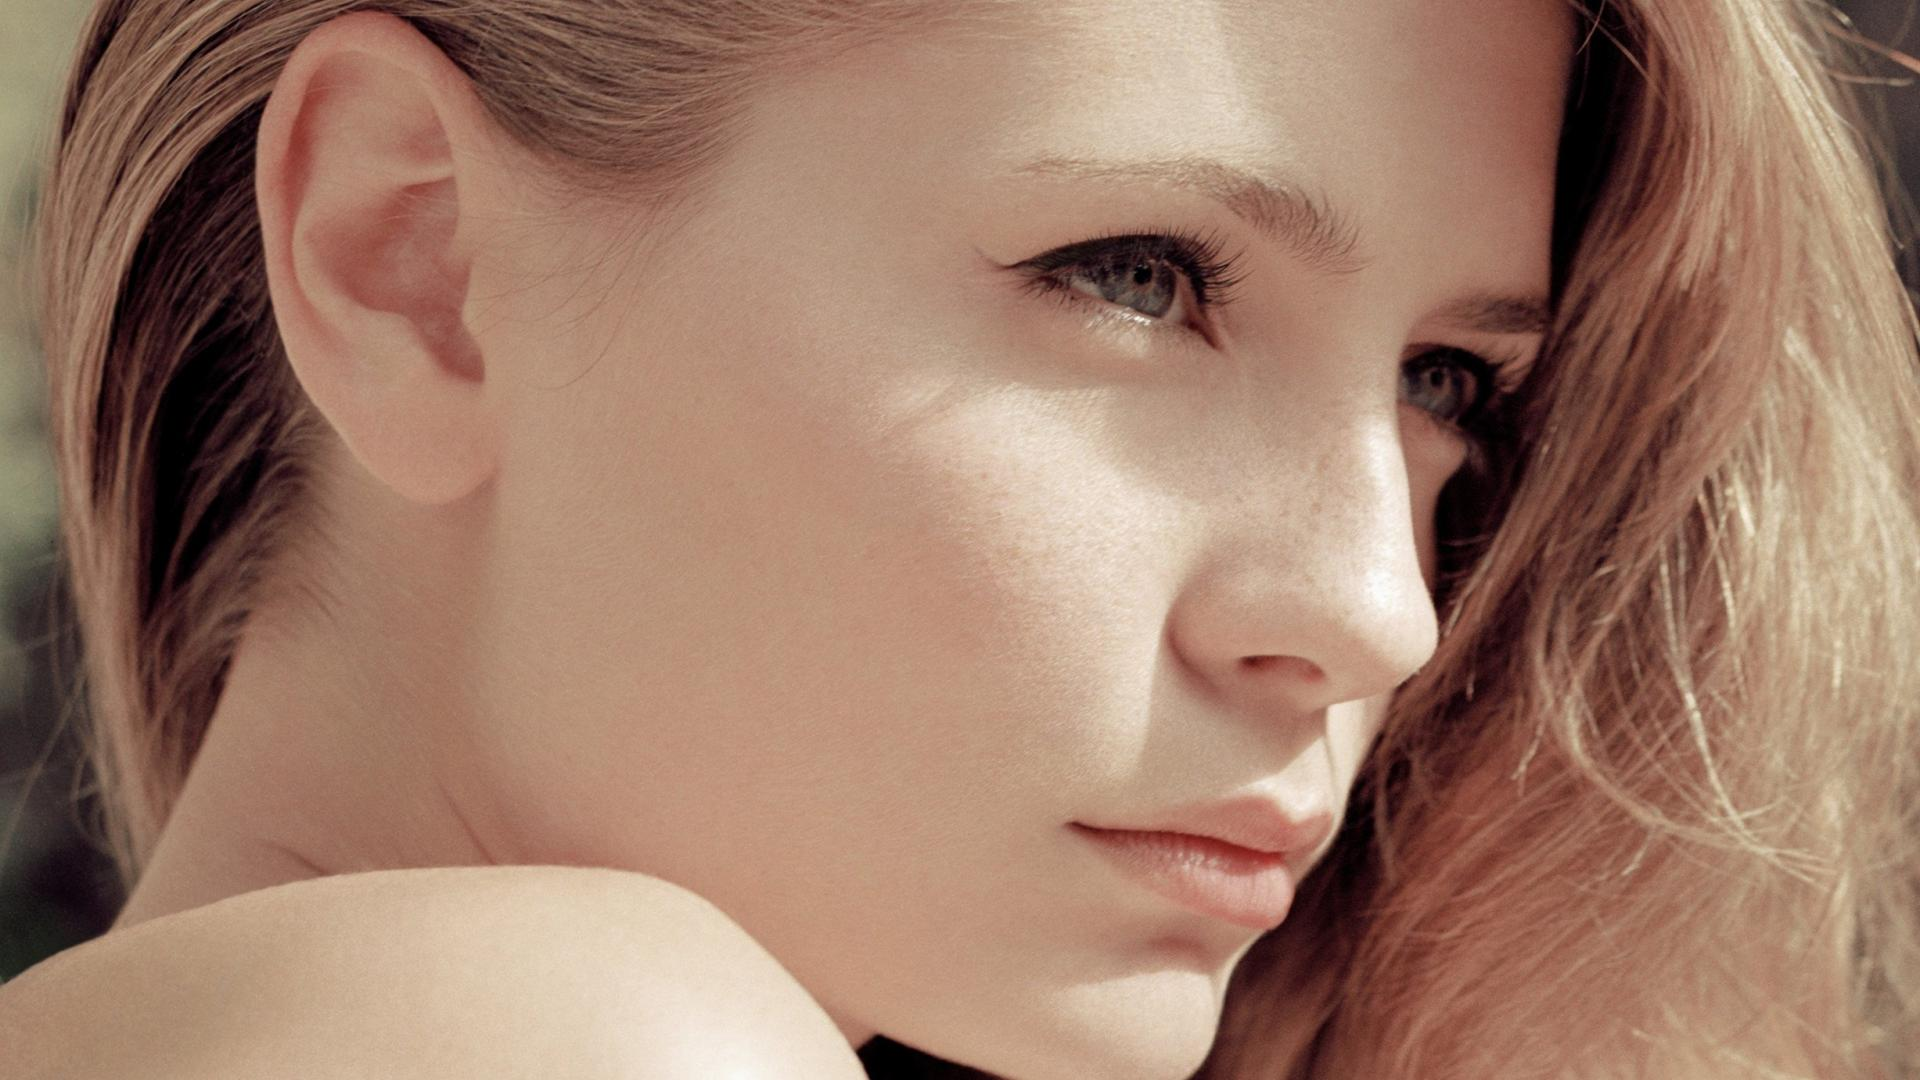 1920x1080_face-of-beautiful-woman-mischa-barton-HD-Wallpaper